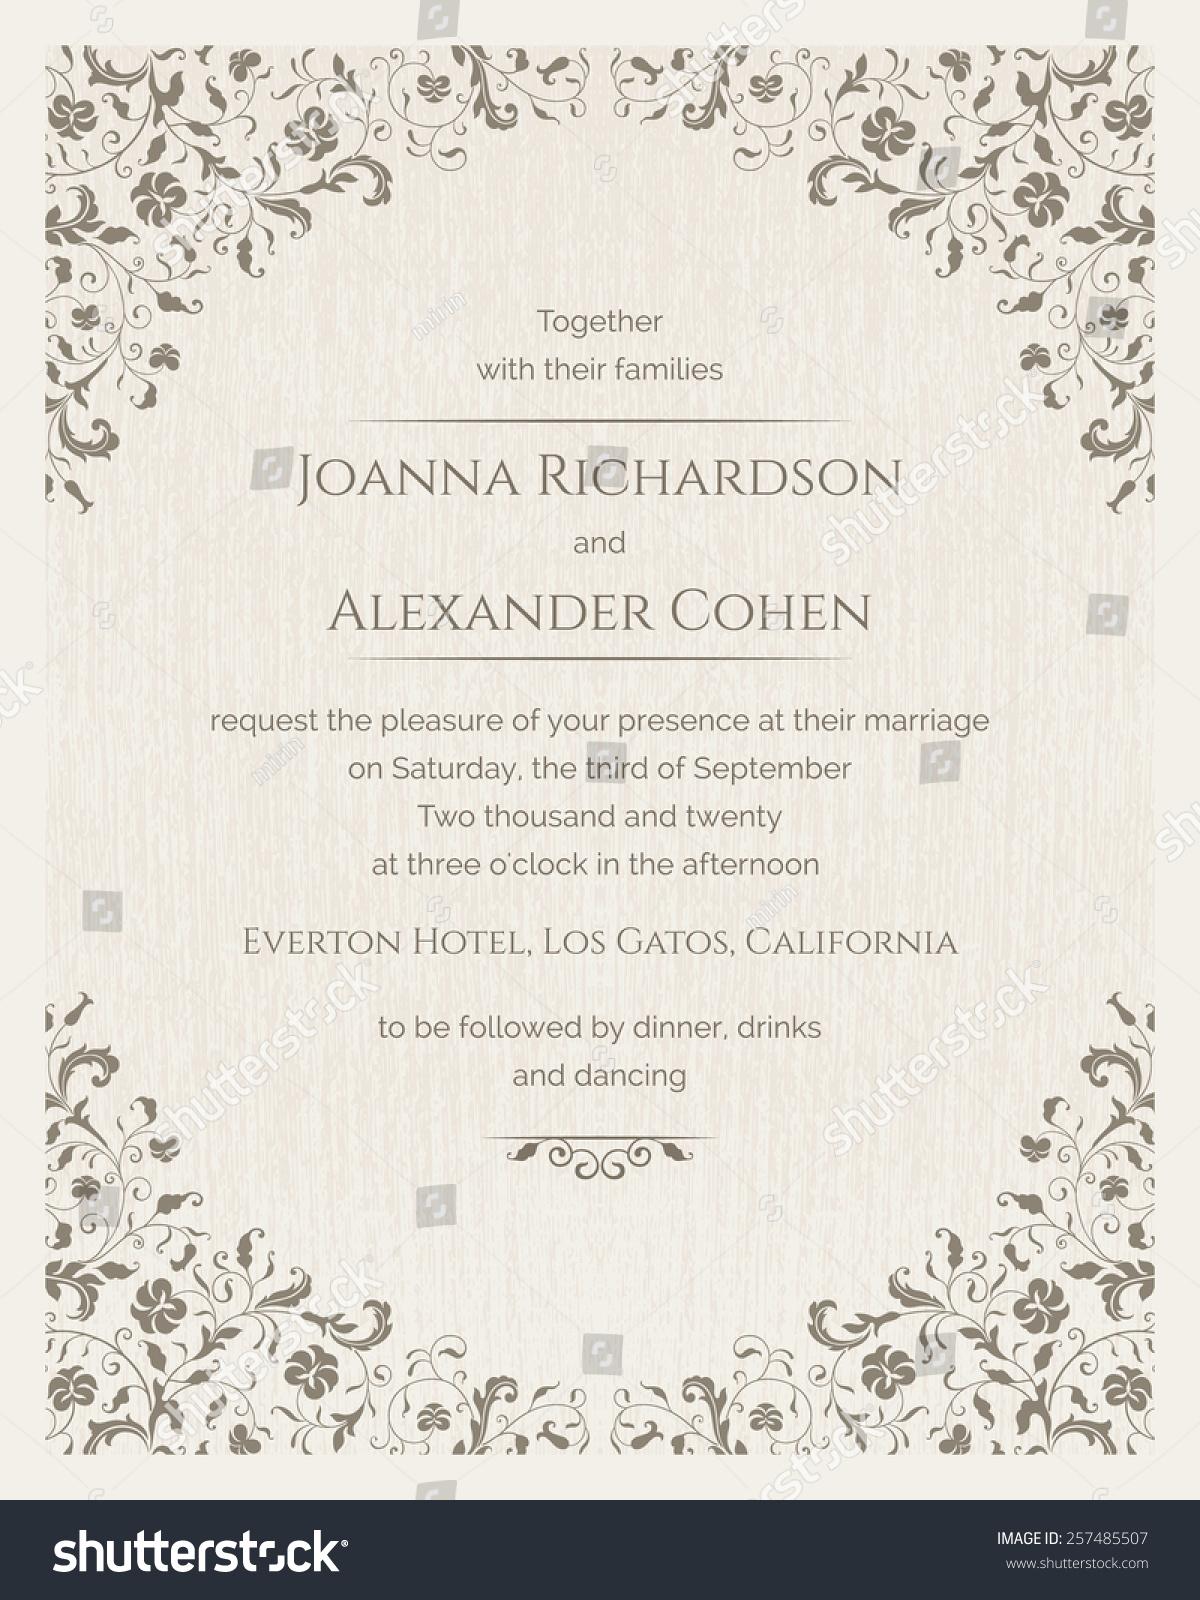 Invitation Card Grunge Texture Wedding Invitation Stock Vector 257485507